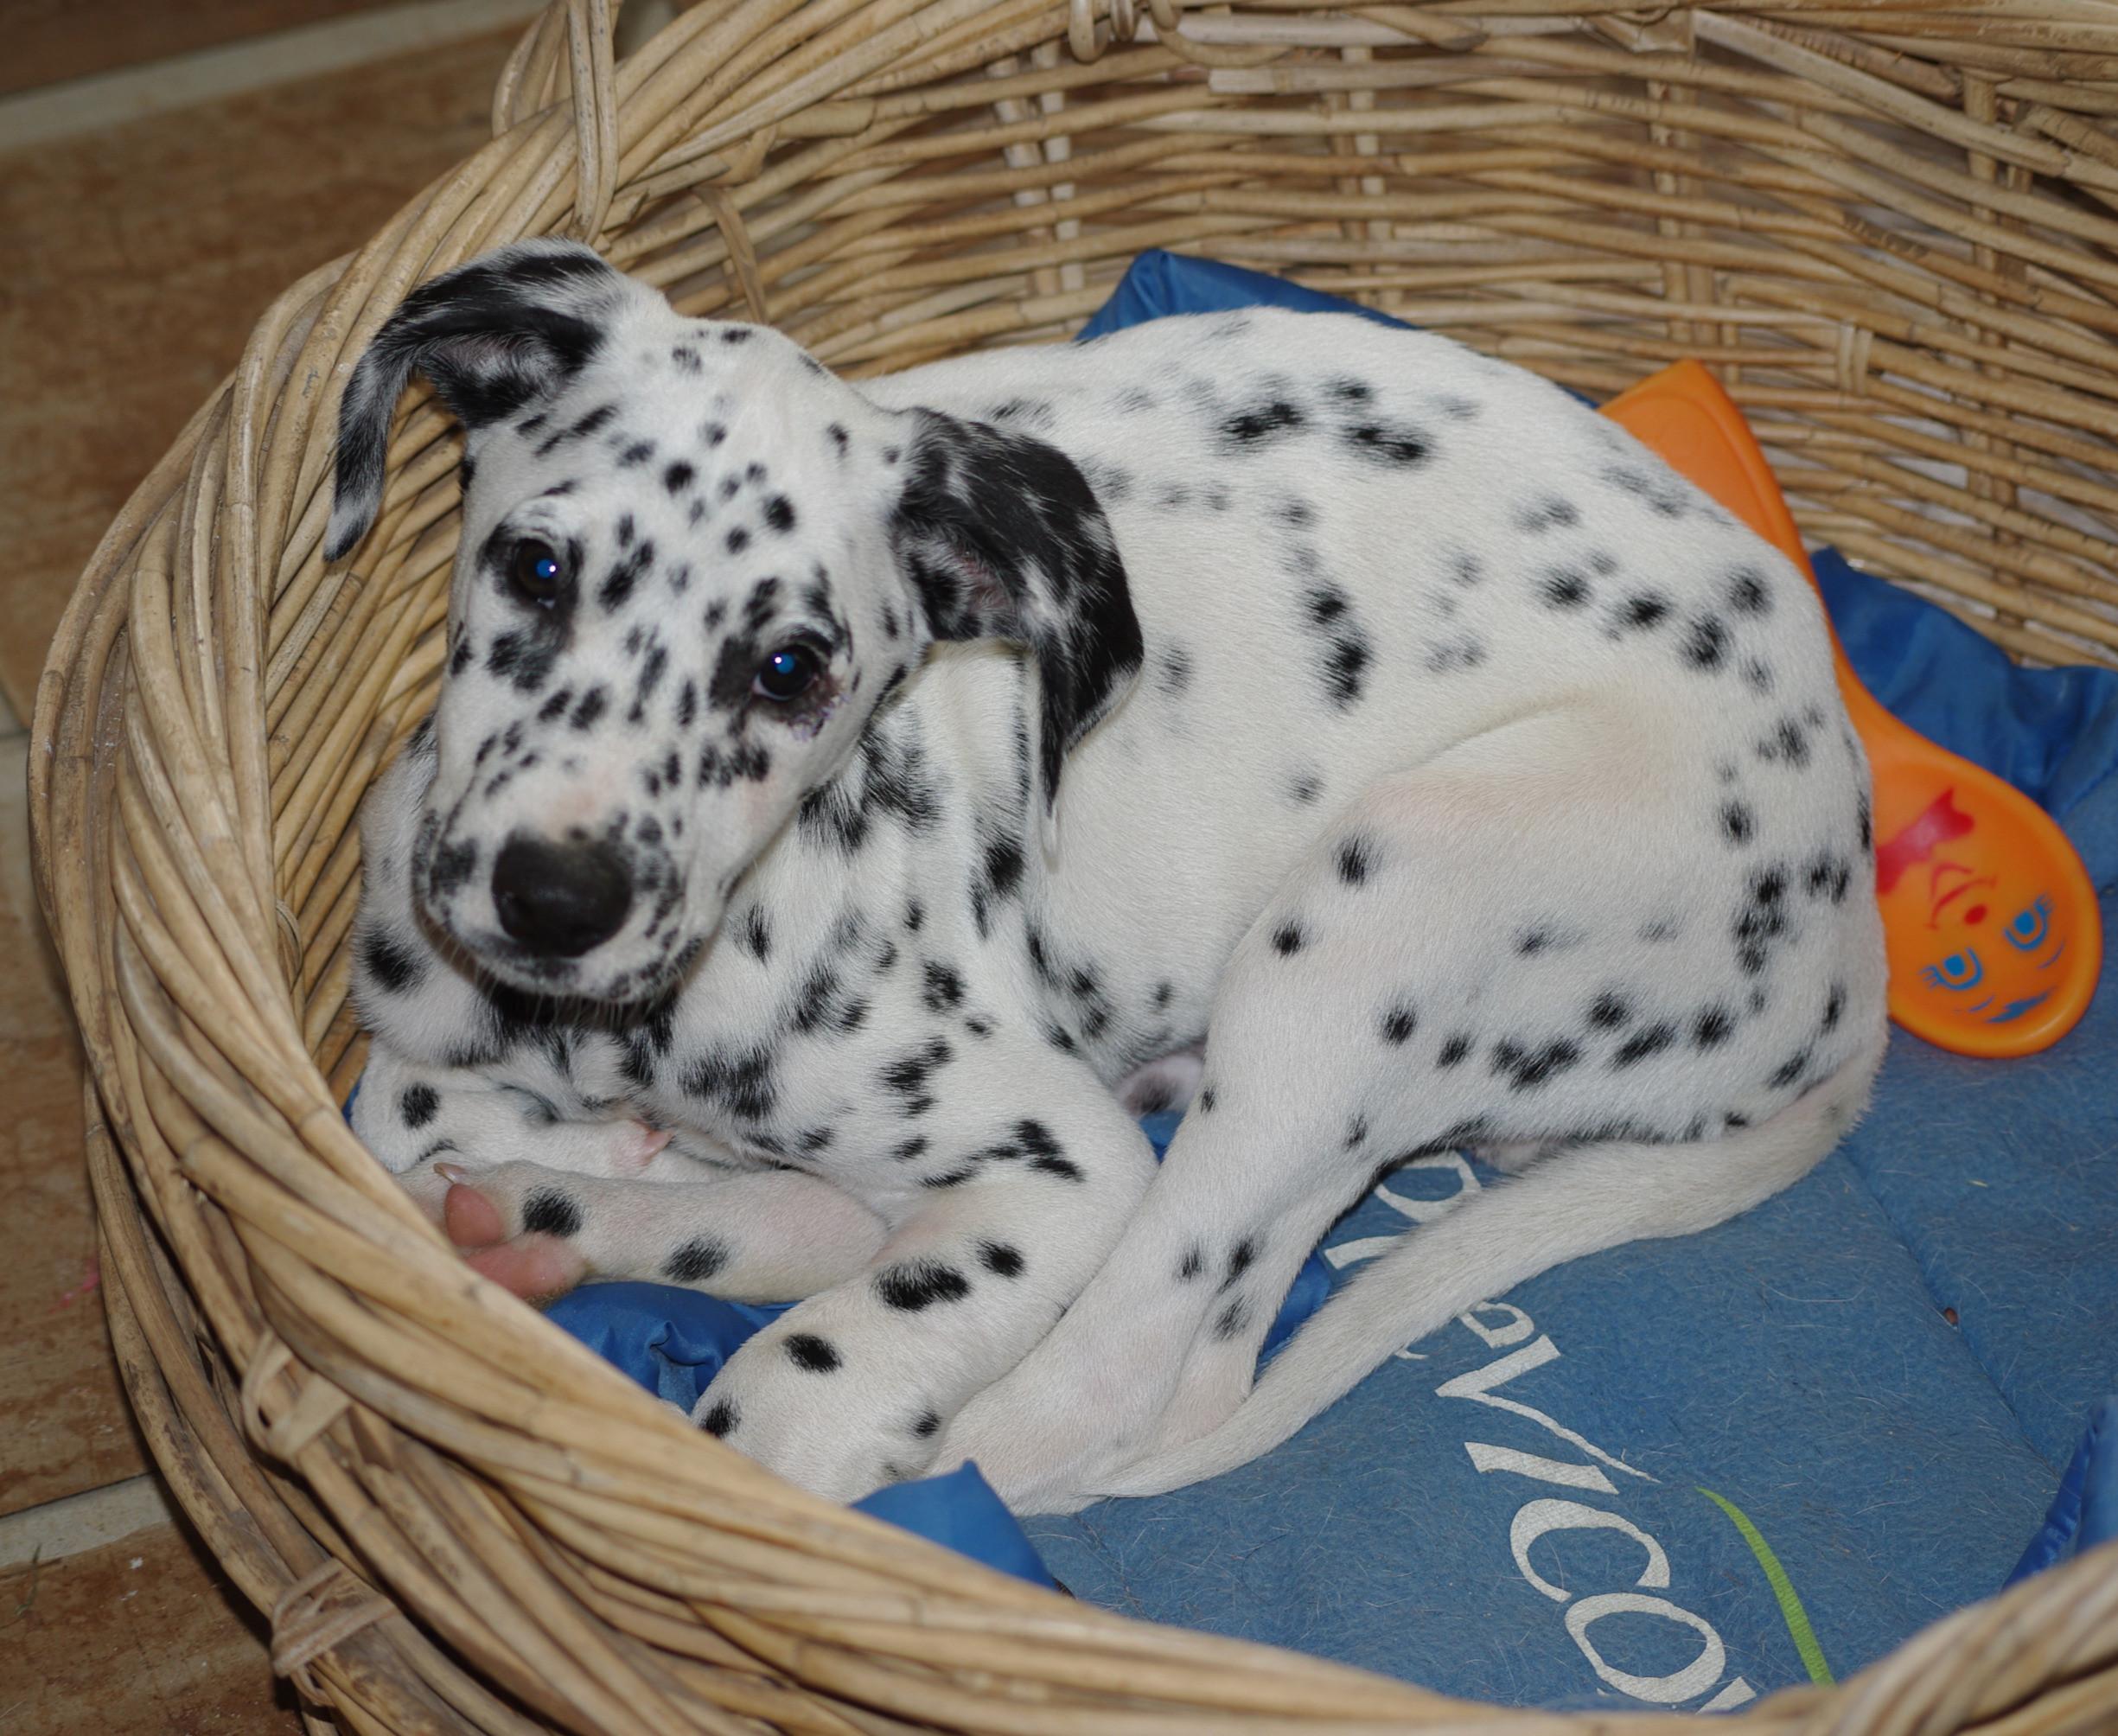 Puppy Primary Sunday 10.15am